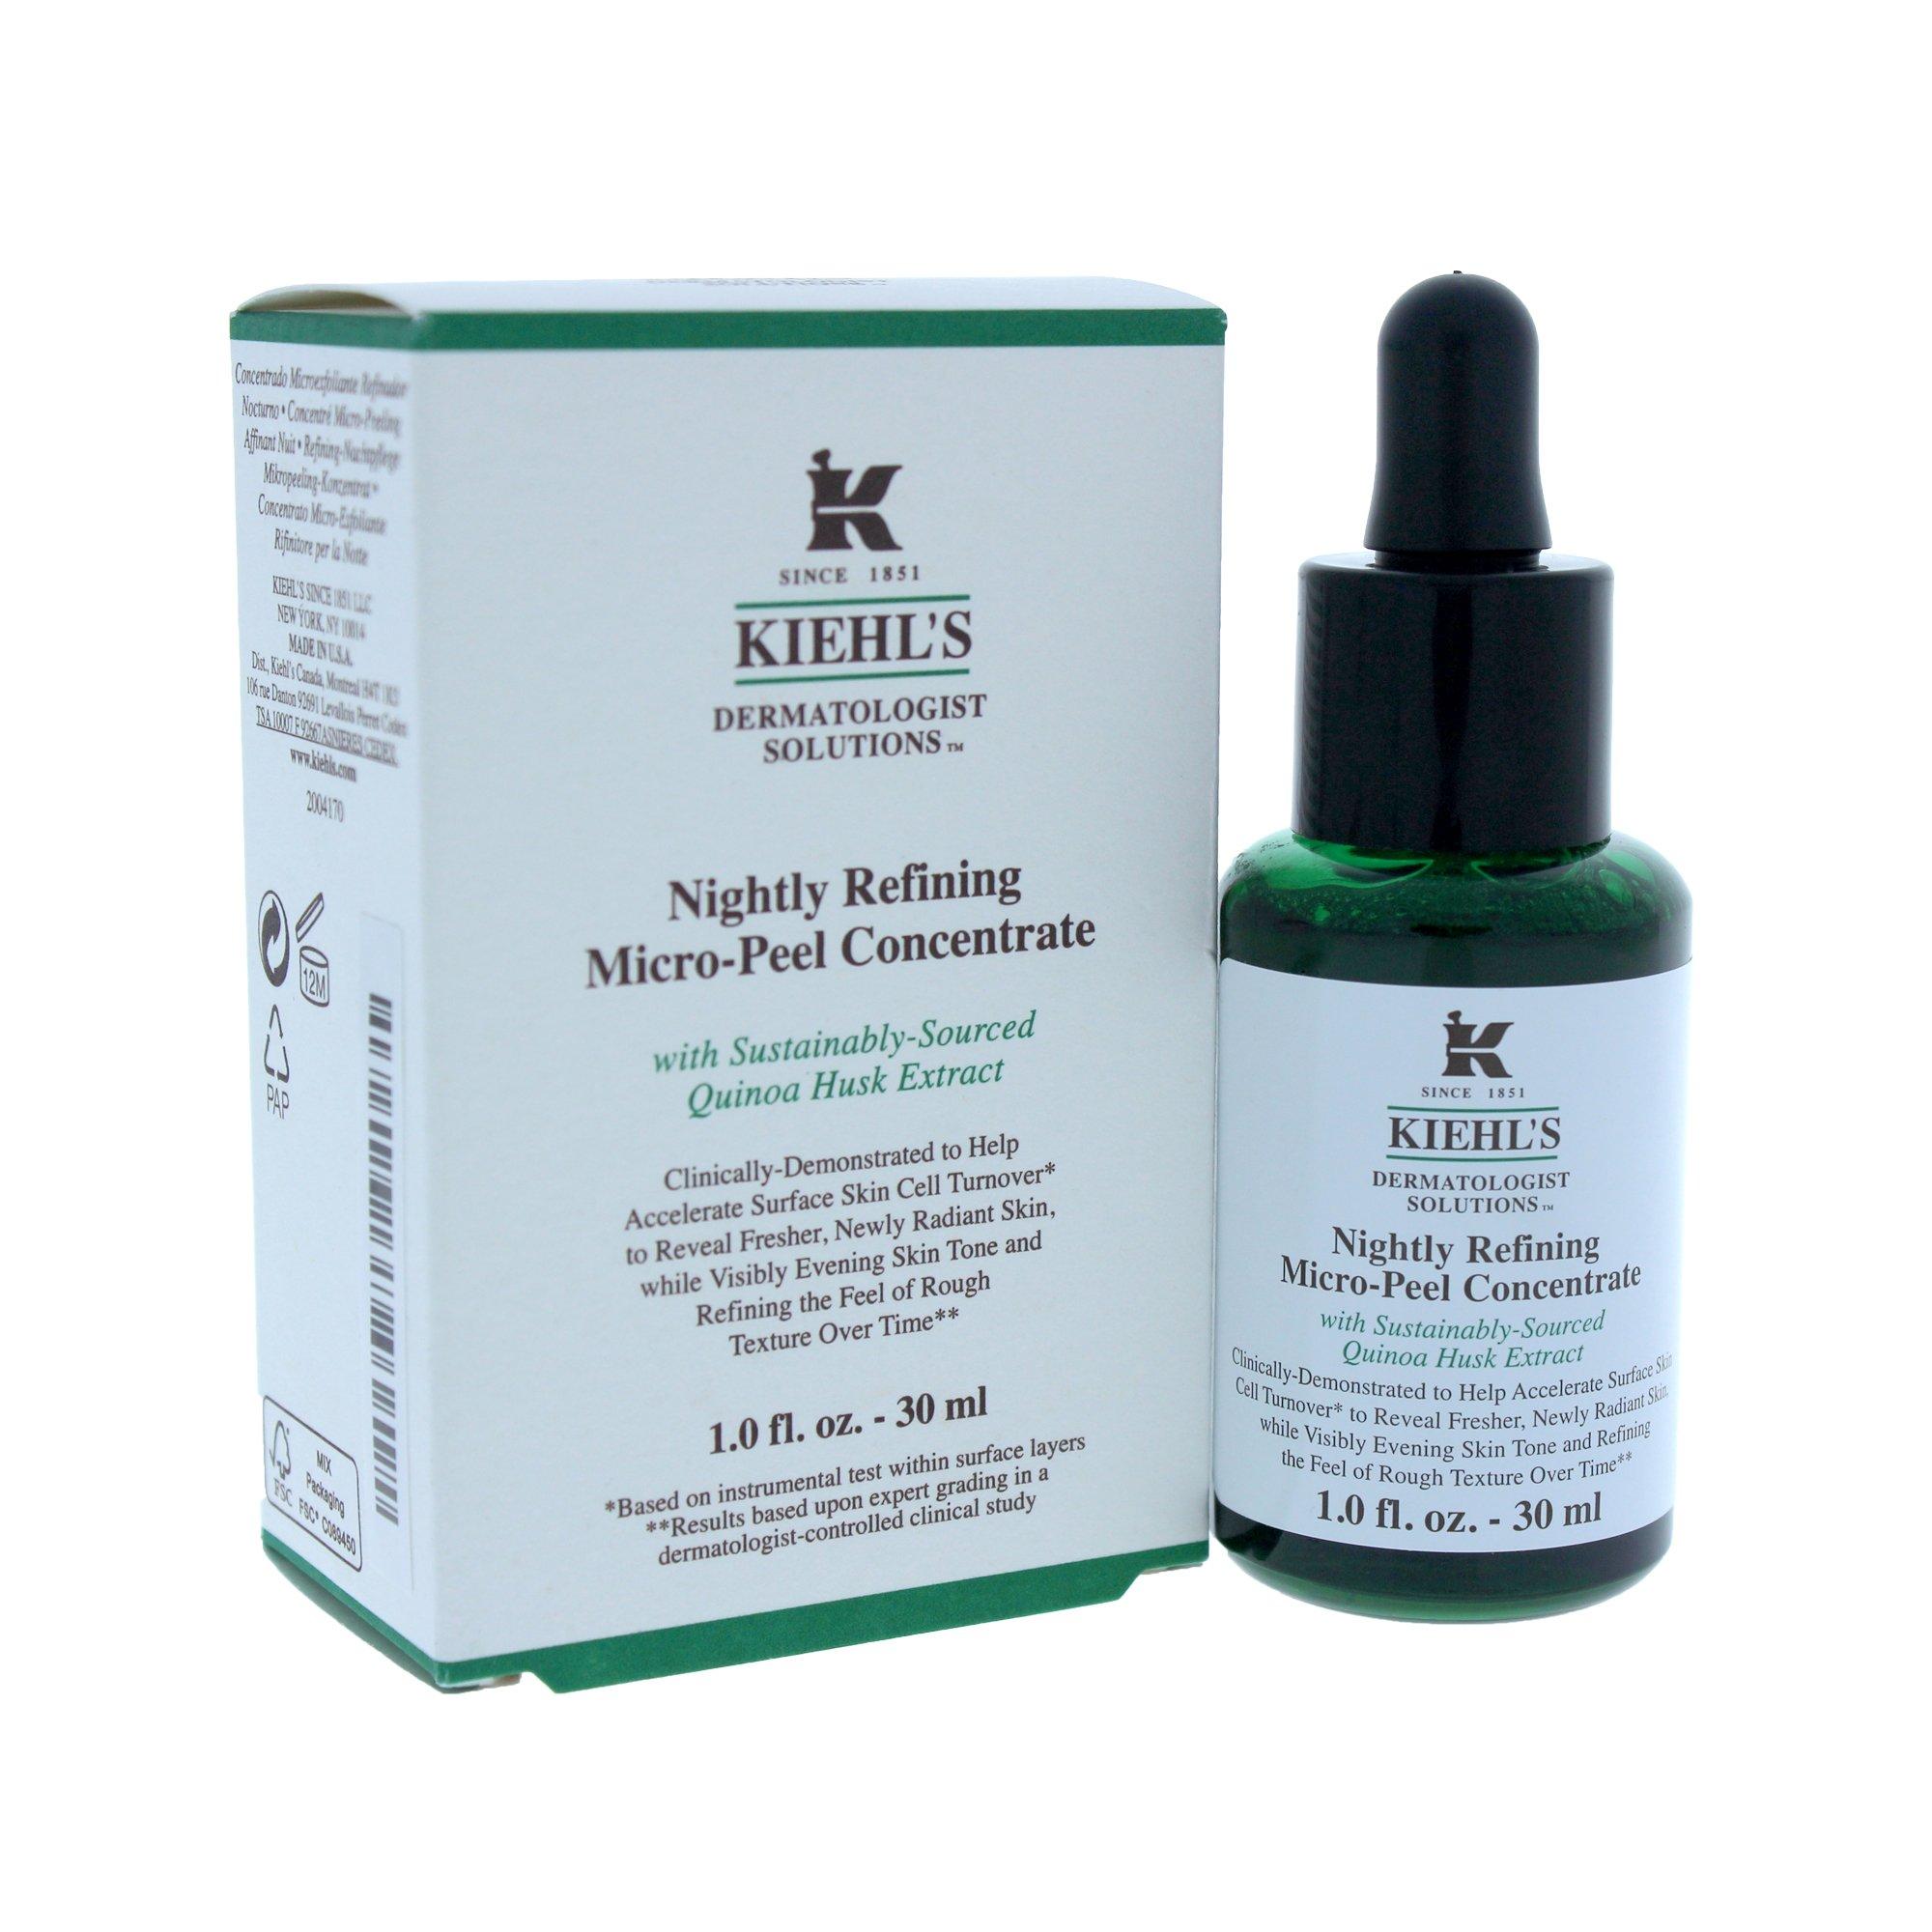 Kiehl's Nightly Refining Micro-Peel Concent 1oz